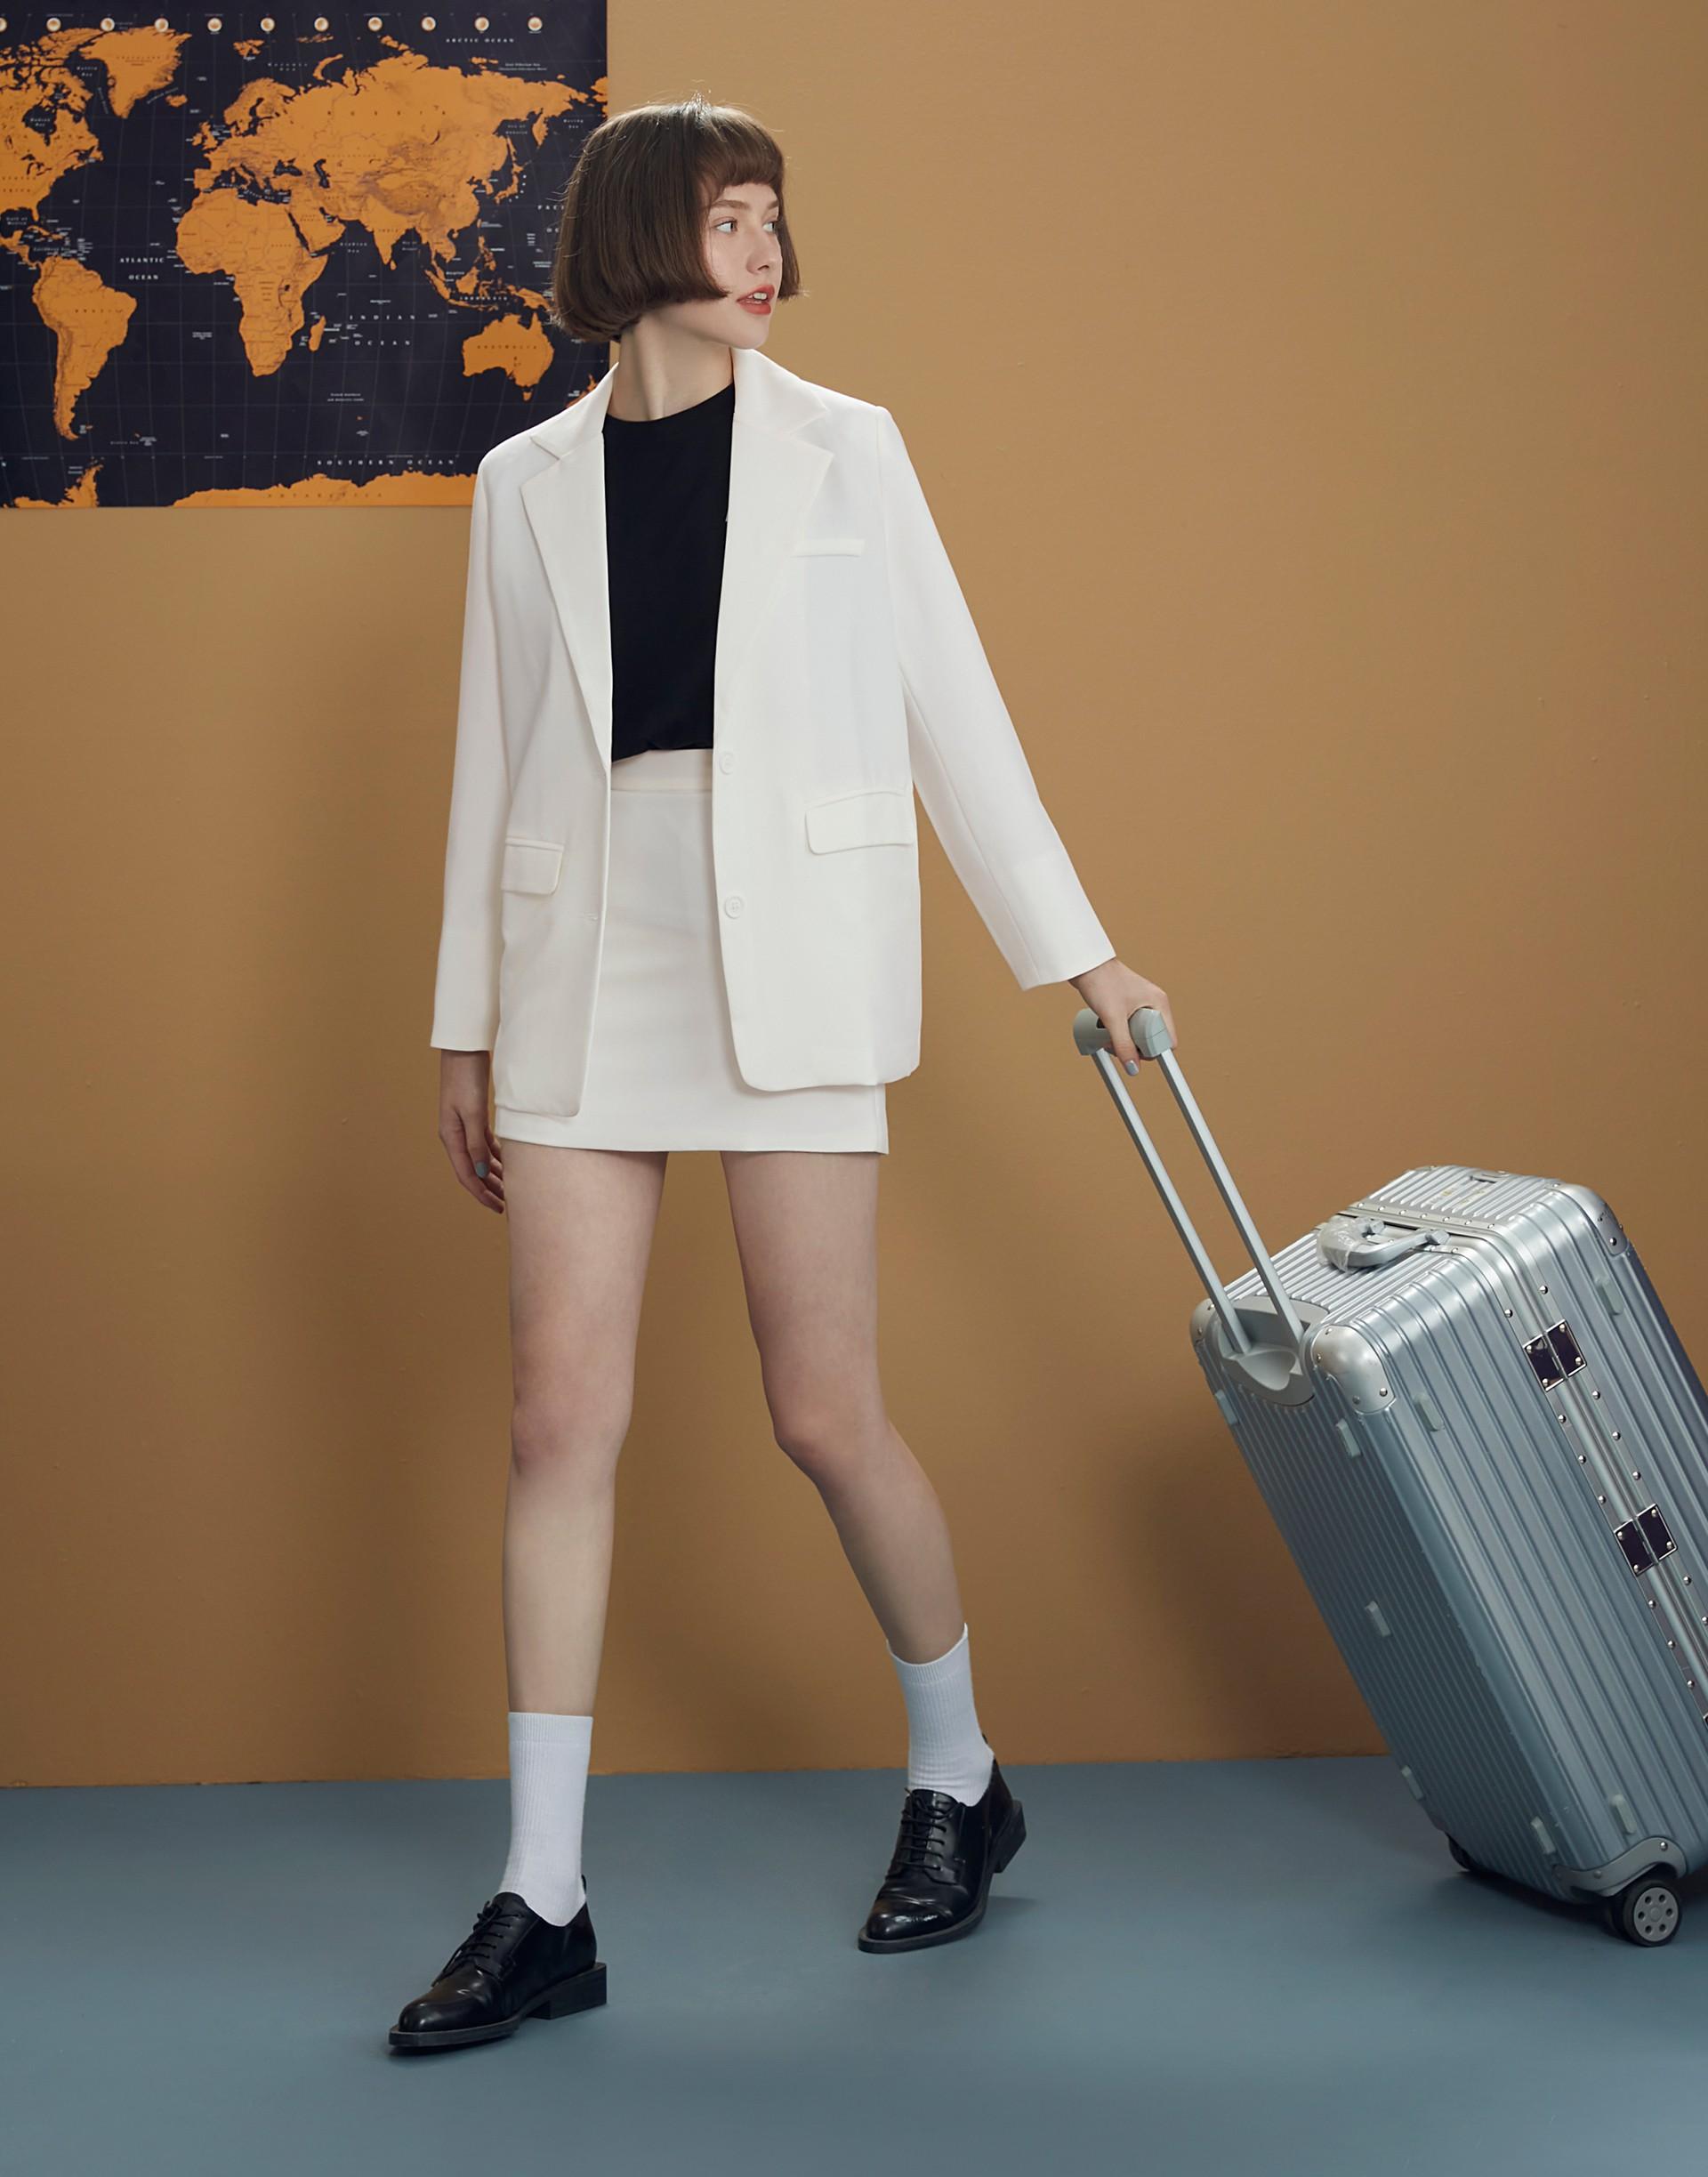 Urban style西裝短裙-女-Genquo